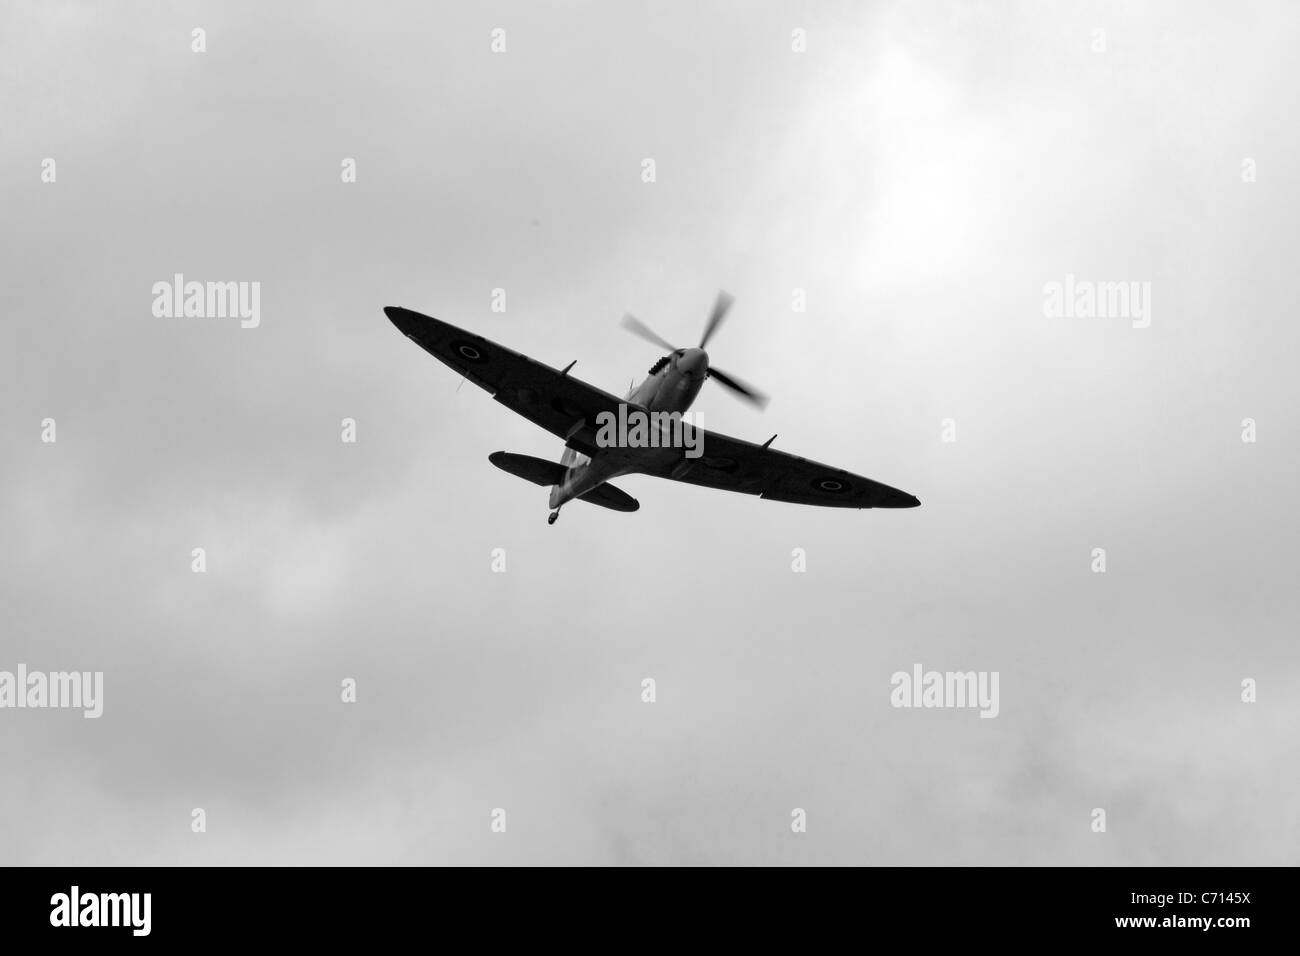 B/W photo of a WW2 British RAF Supermarine Spitfire Plane - Stock Image